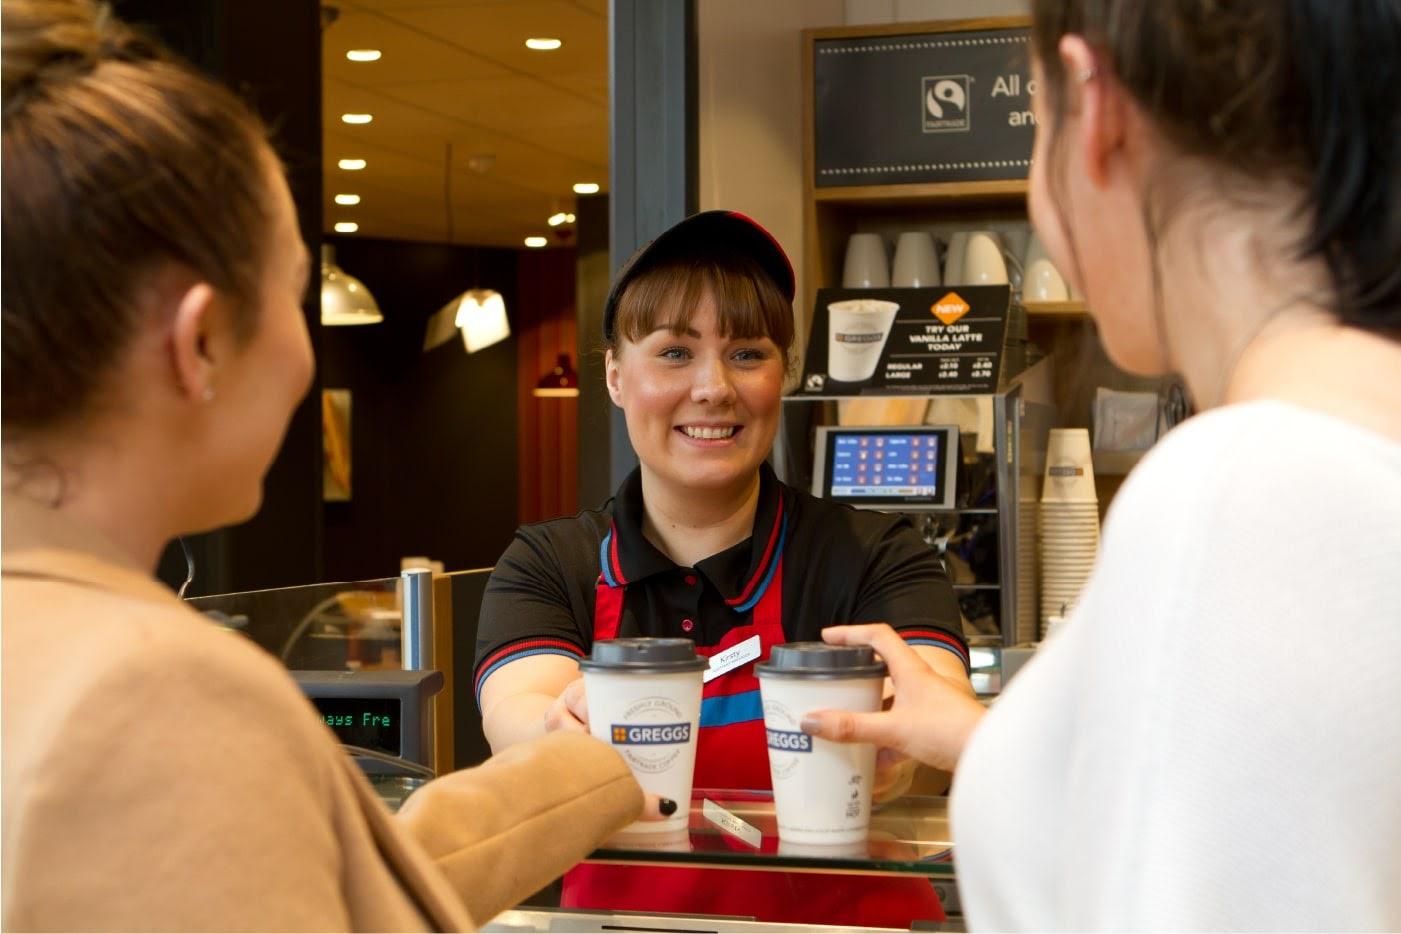 Greggs employee handing over coffees